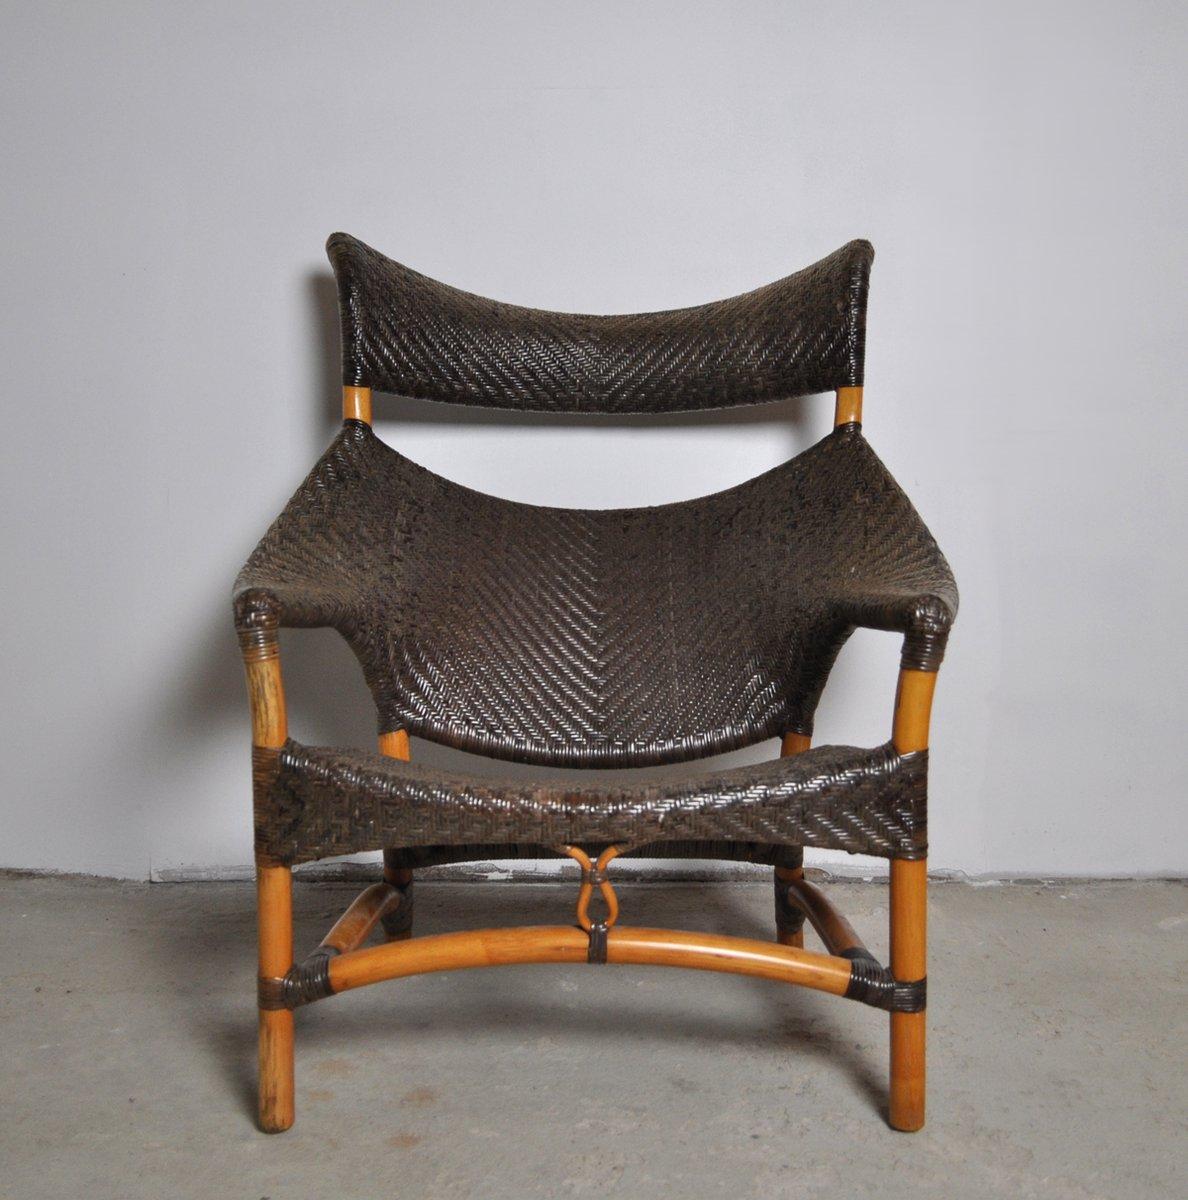 Woven Rattan Chair Amp Stool By Yuzuru Yamakawa 1980s For